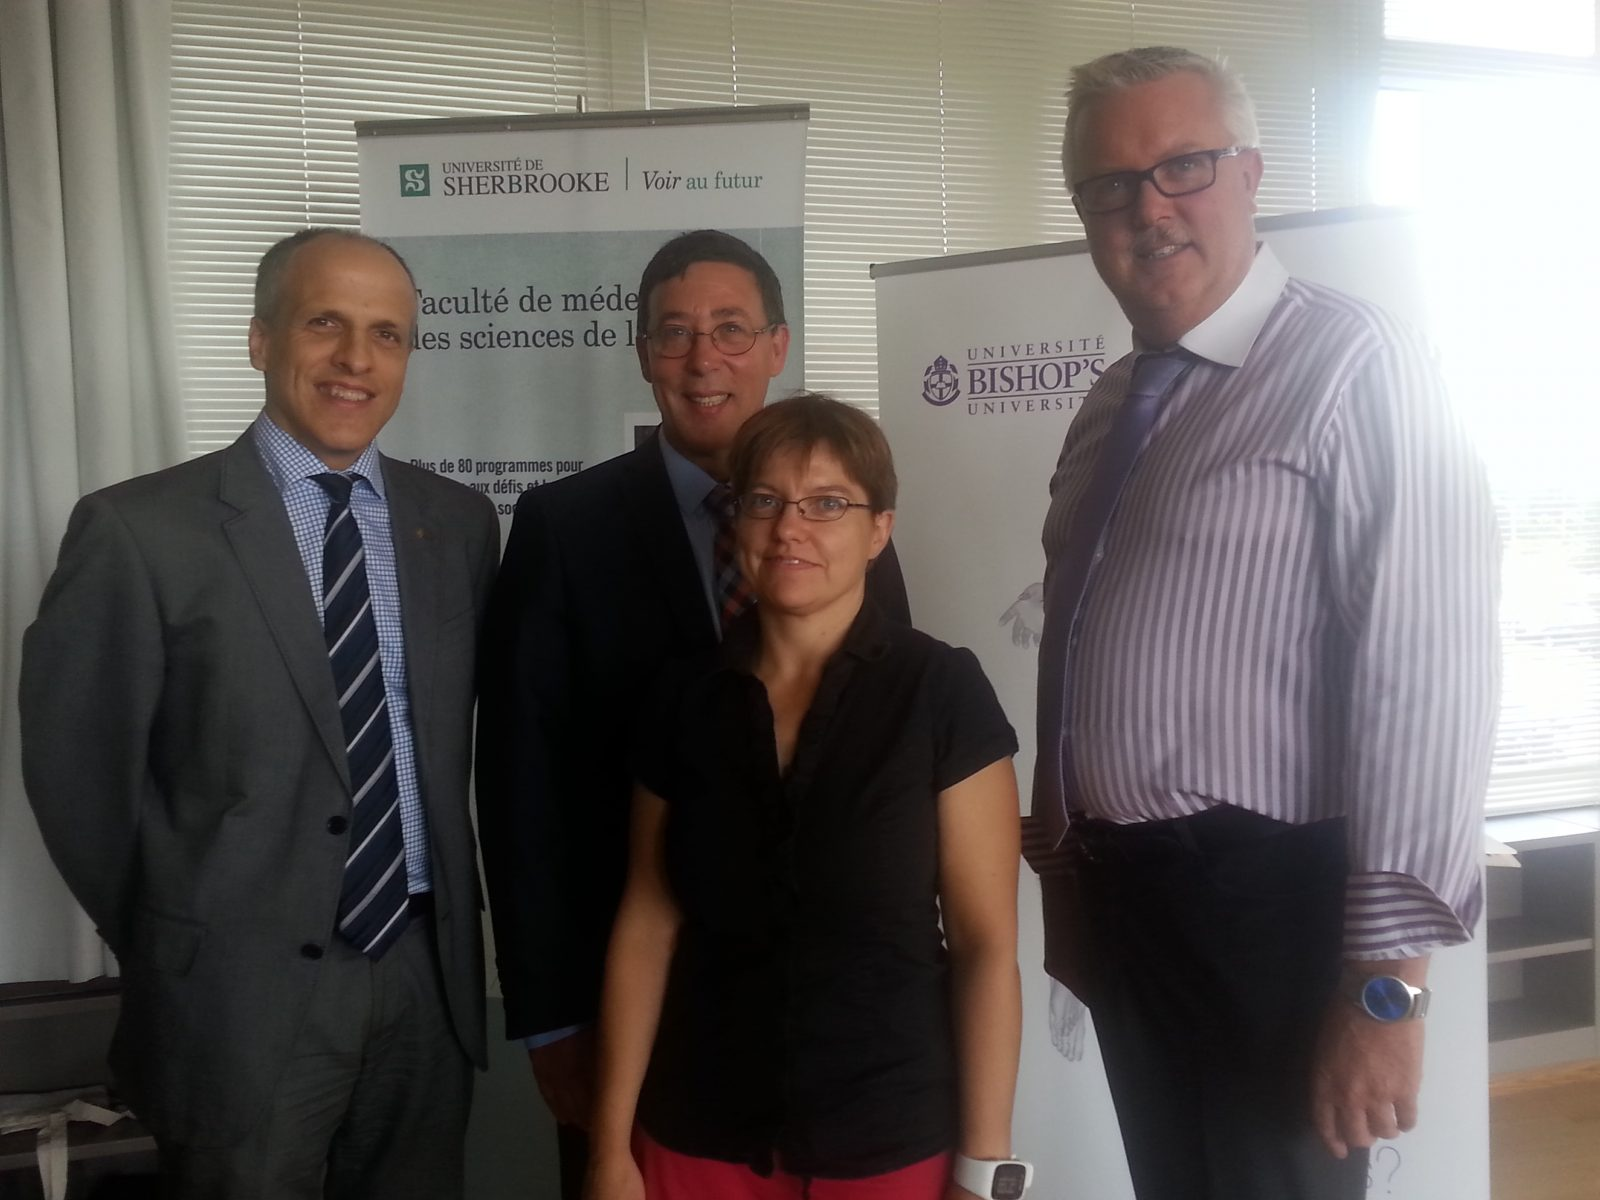 Sherbrooke universities sign research partnership